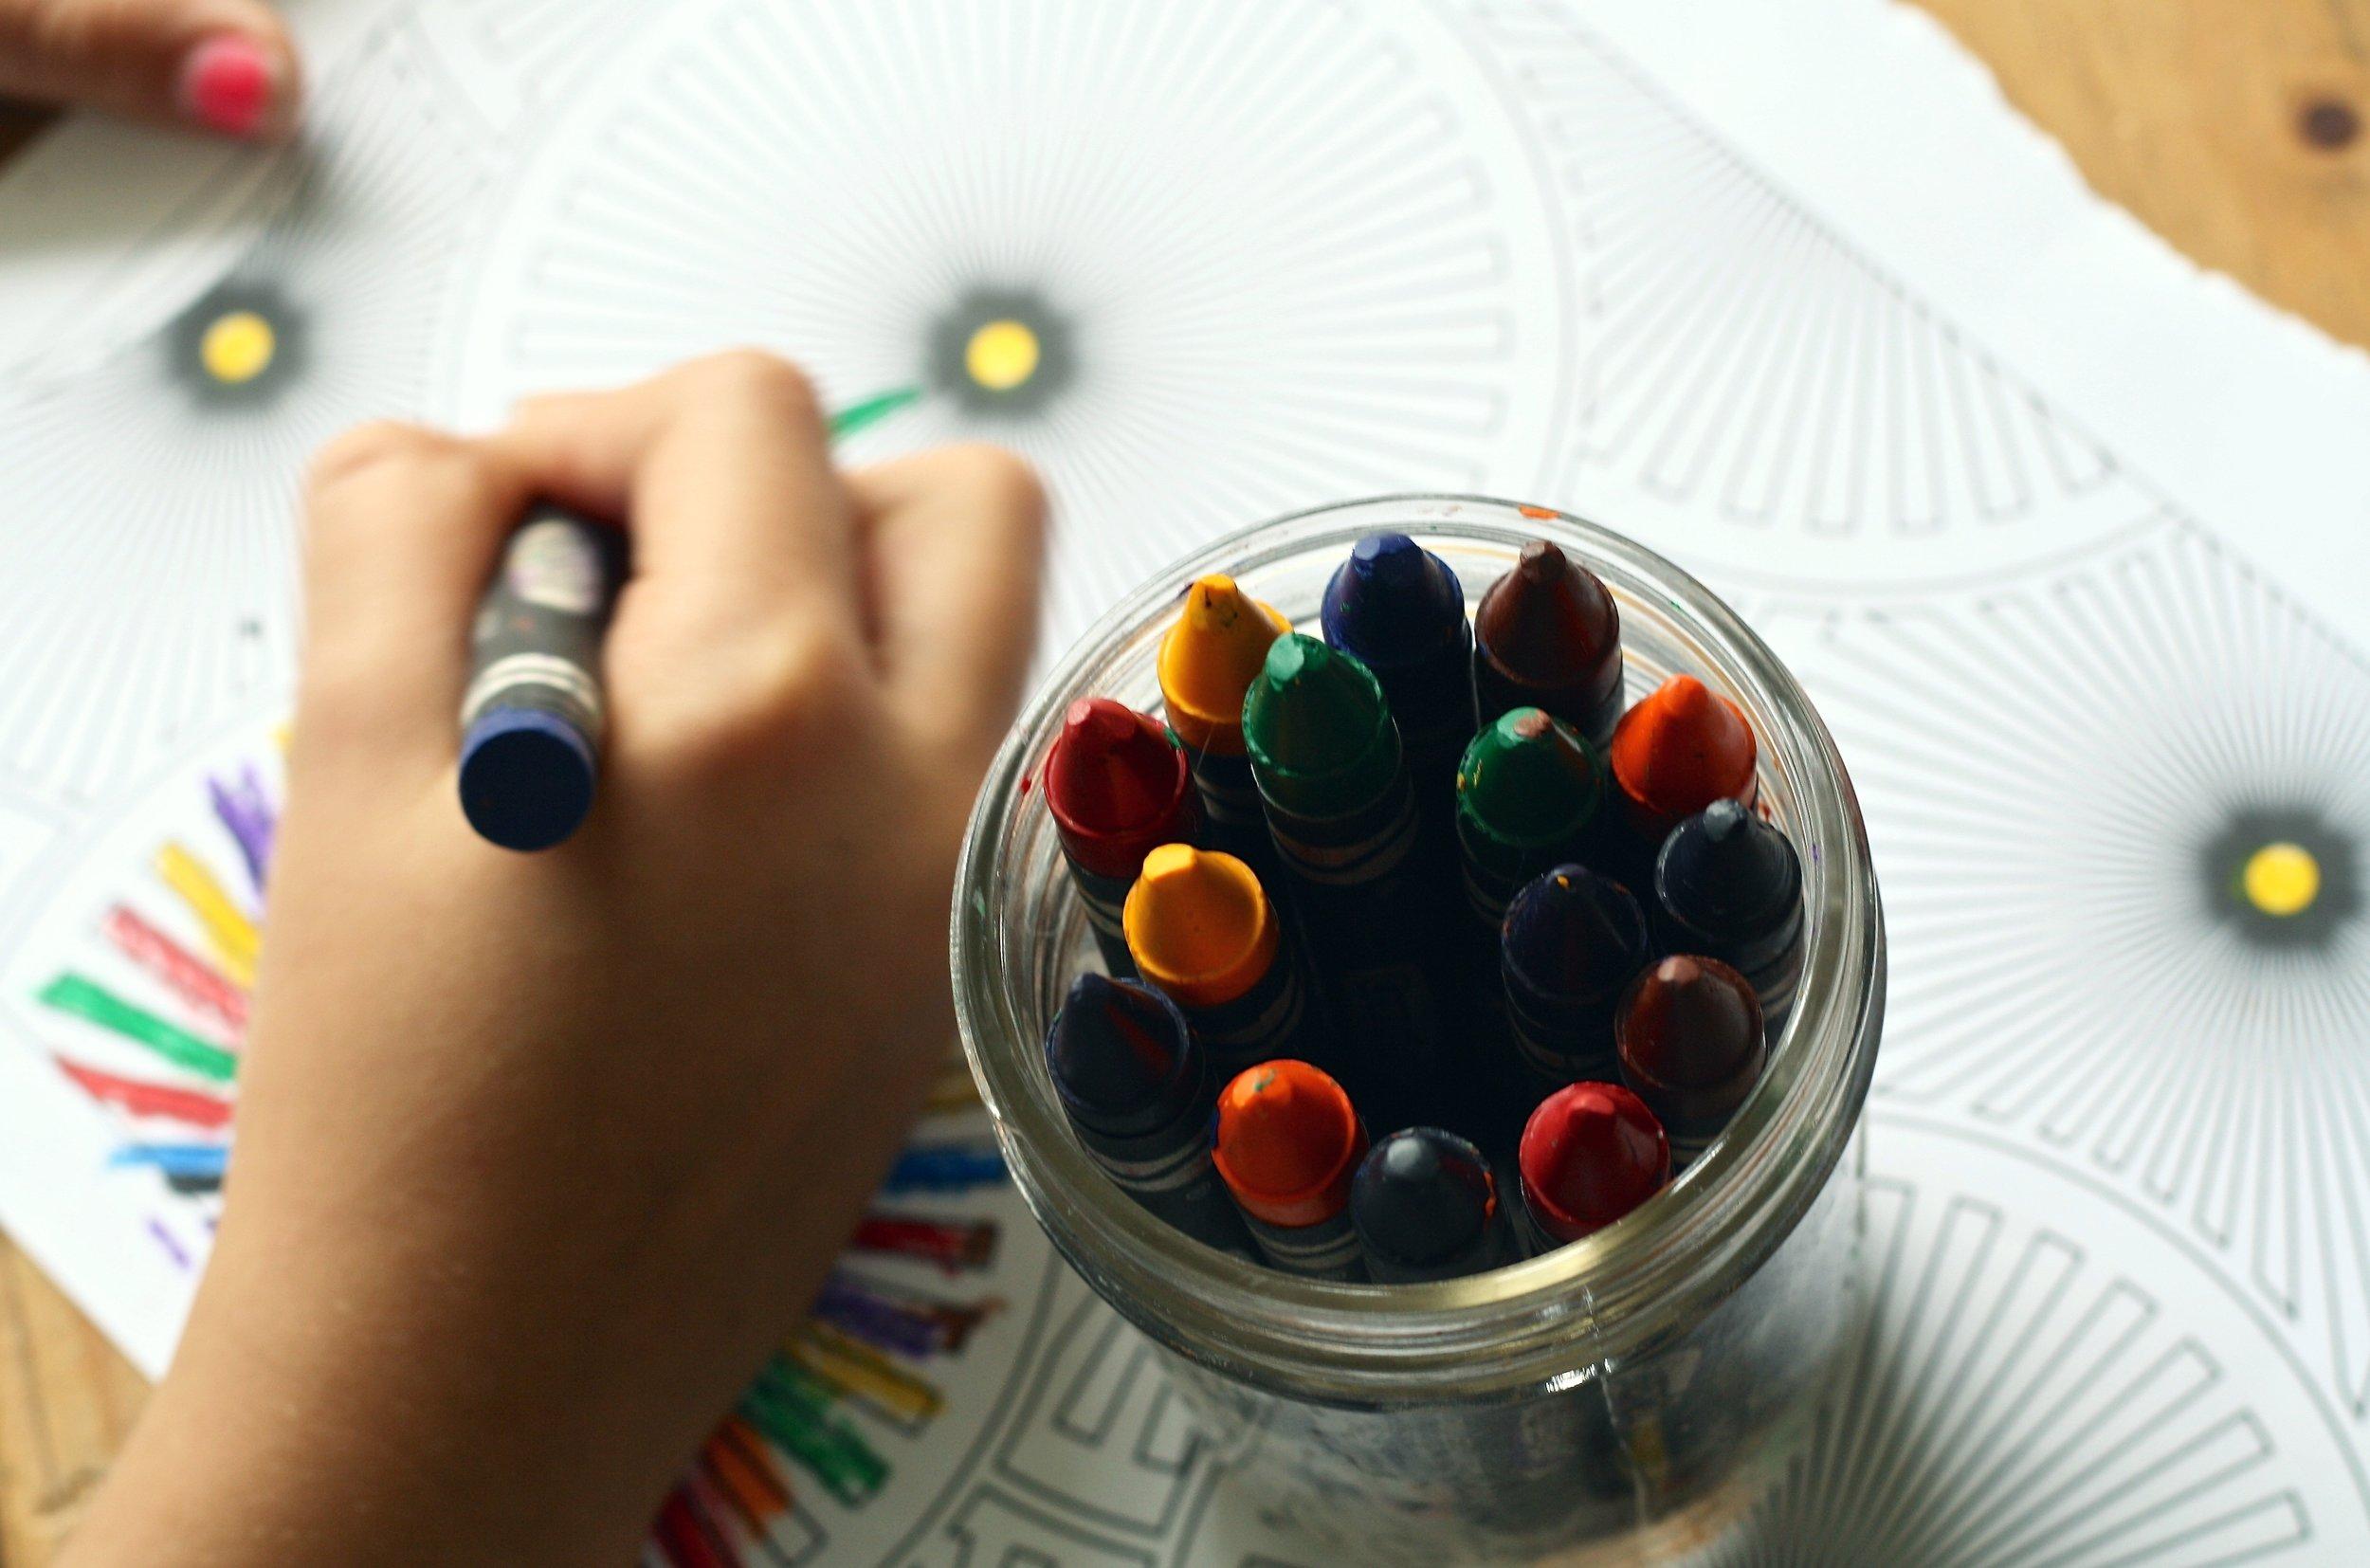 crayons-coloring-book-coloring-book-159579.jpeg